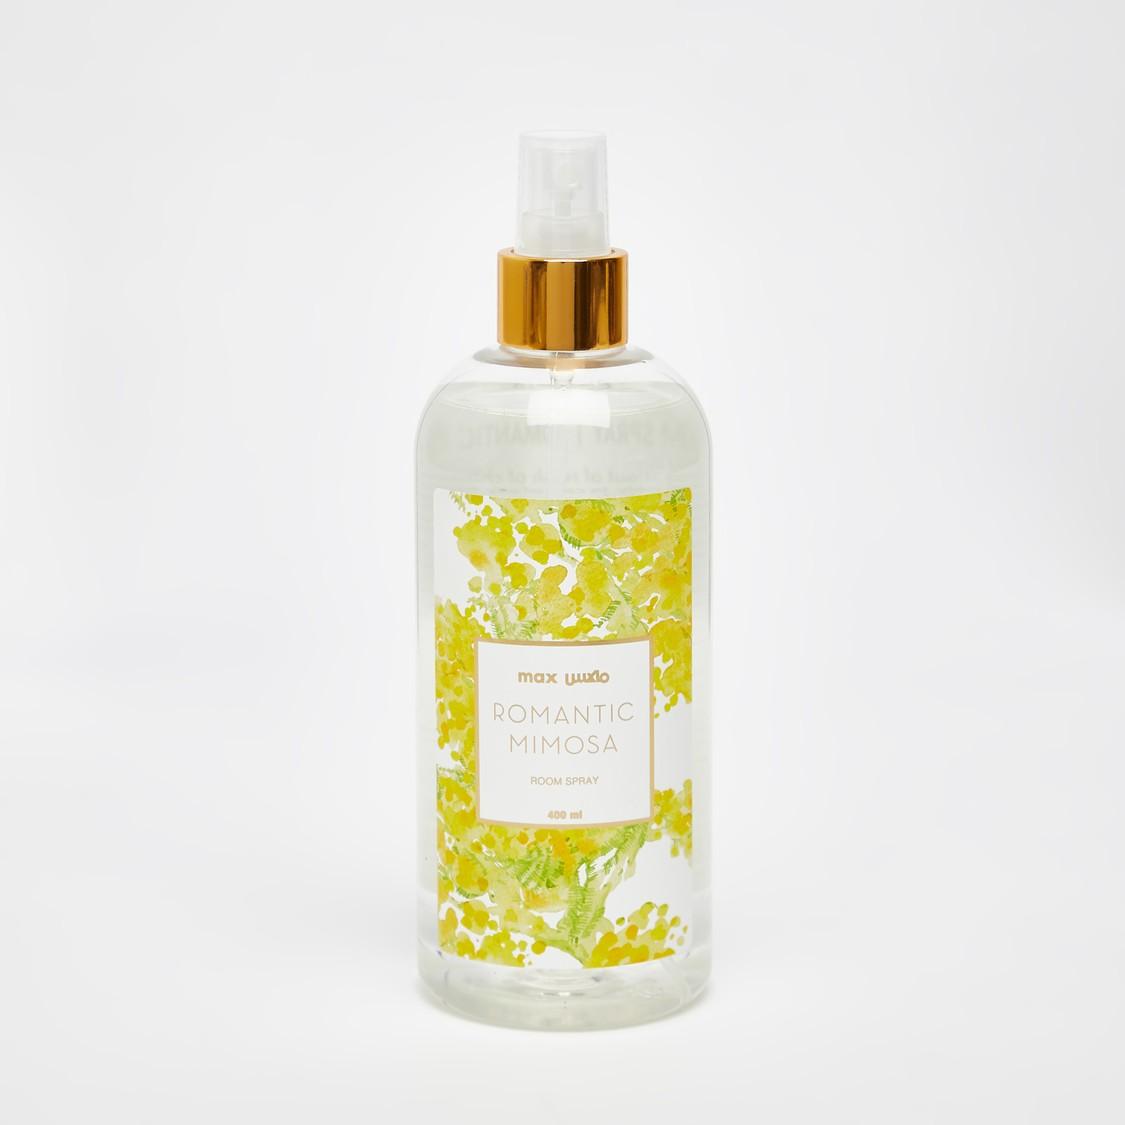 Romantic Mimosa Room Spray - 400 ml